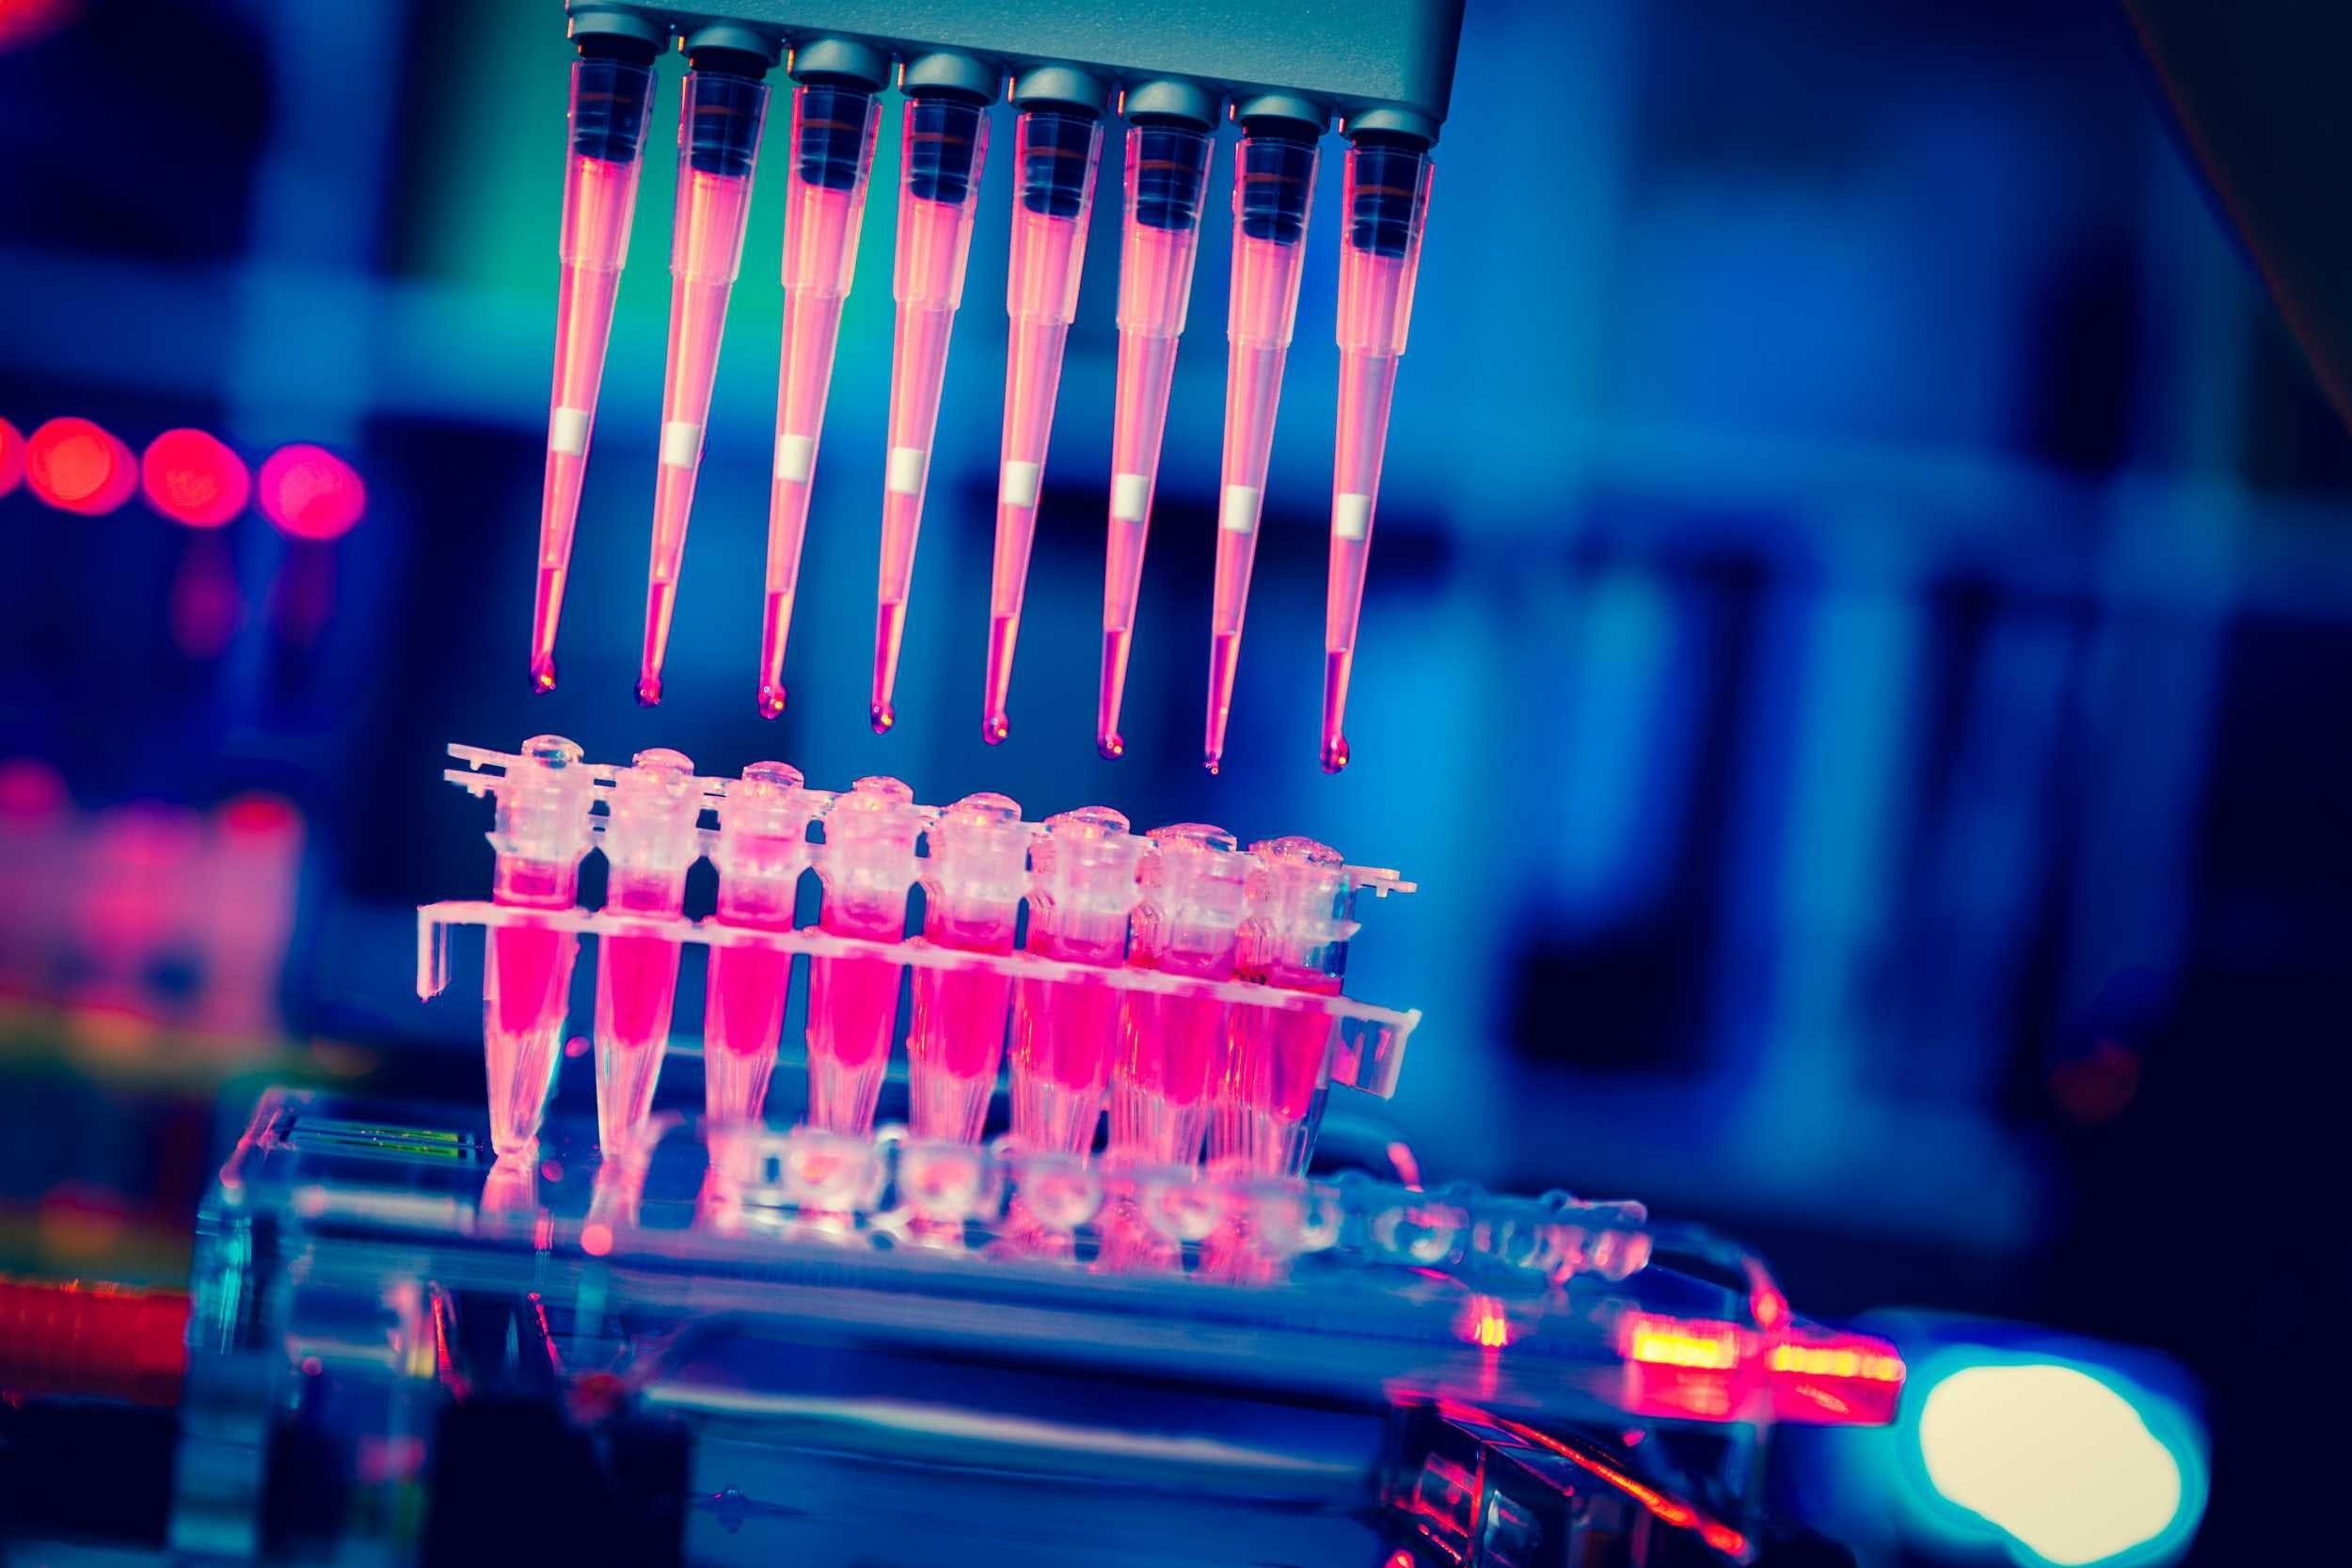 A device places liquid into test tubes under ultraviolet light.